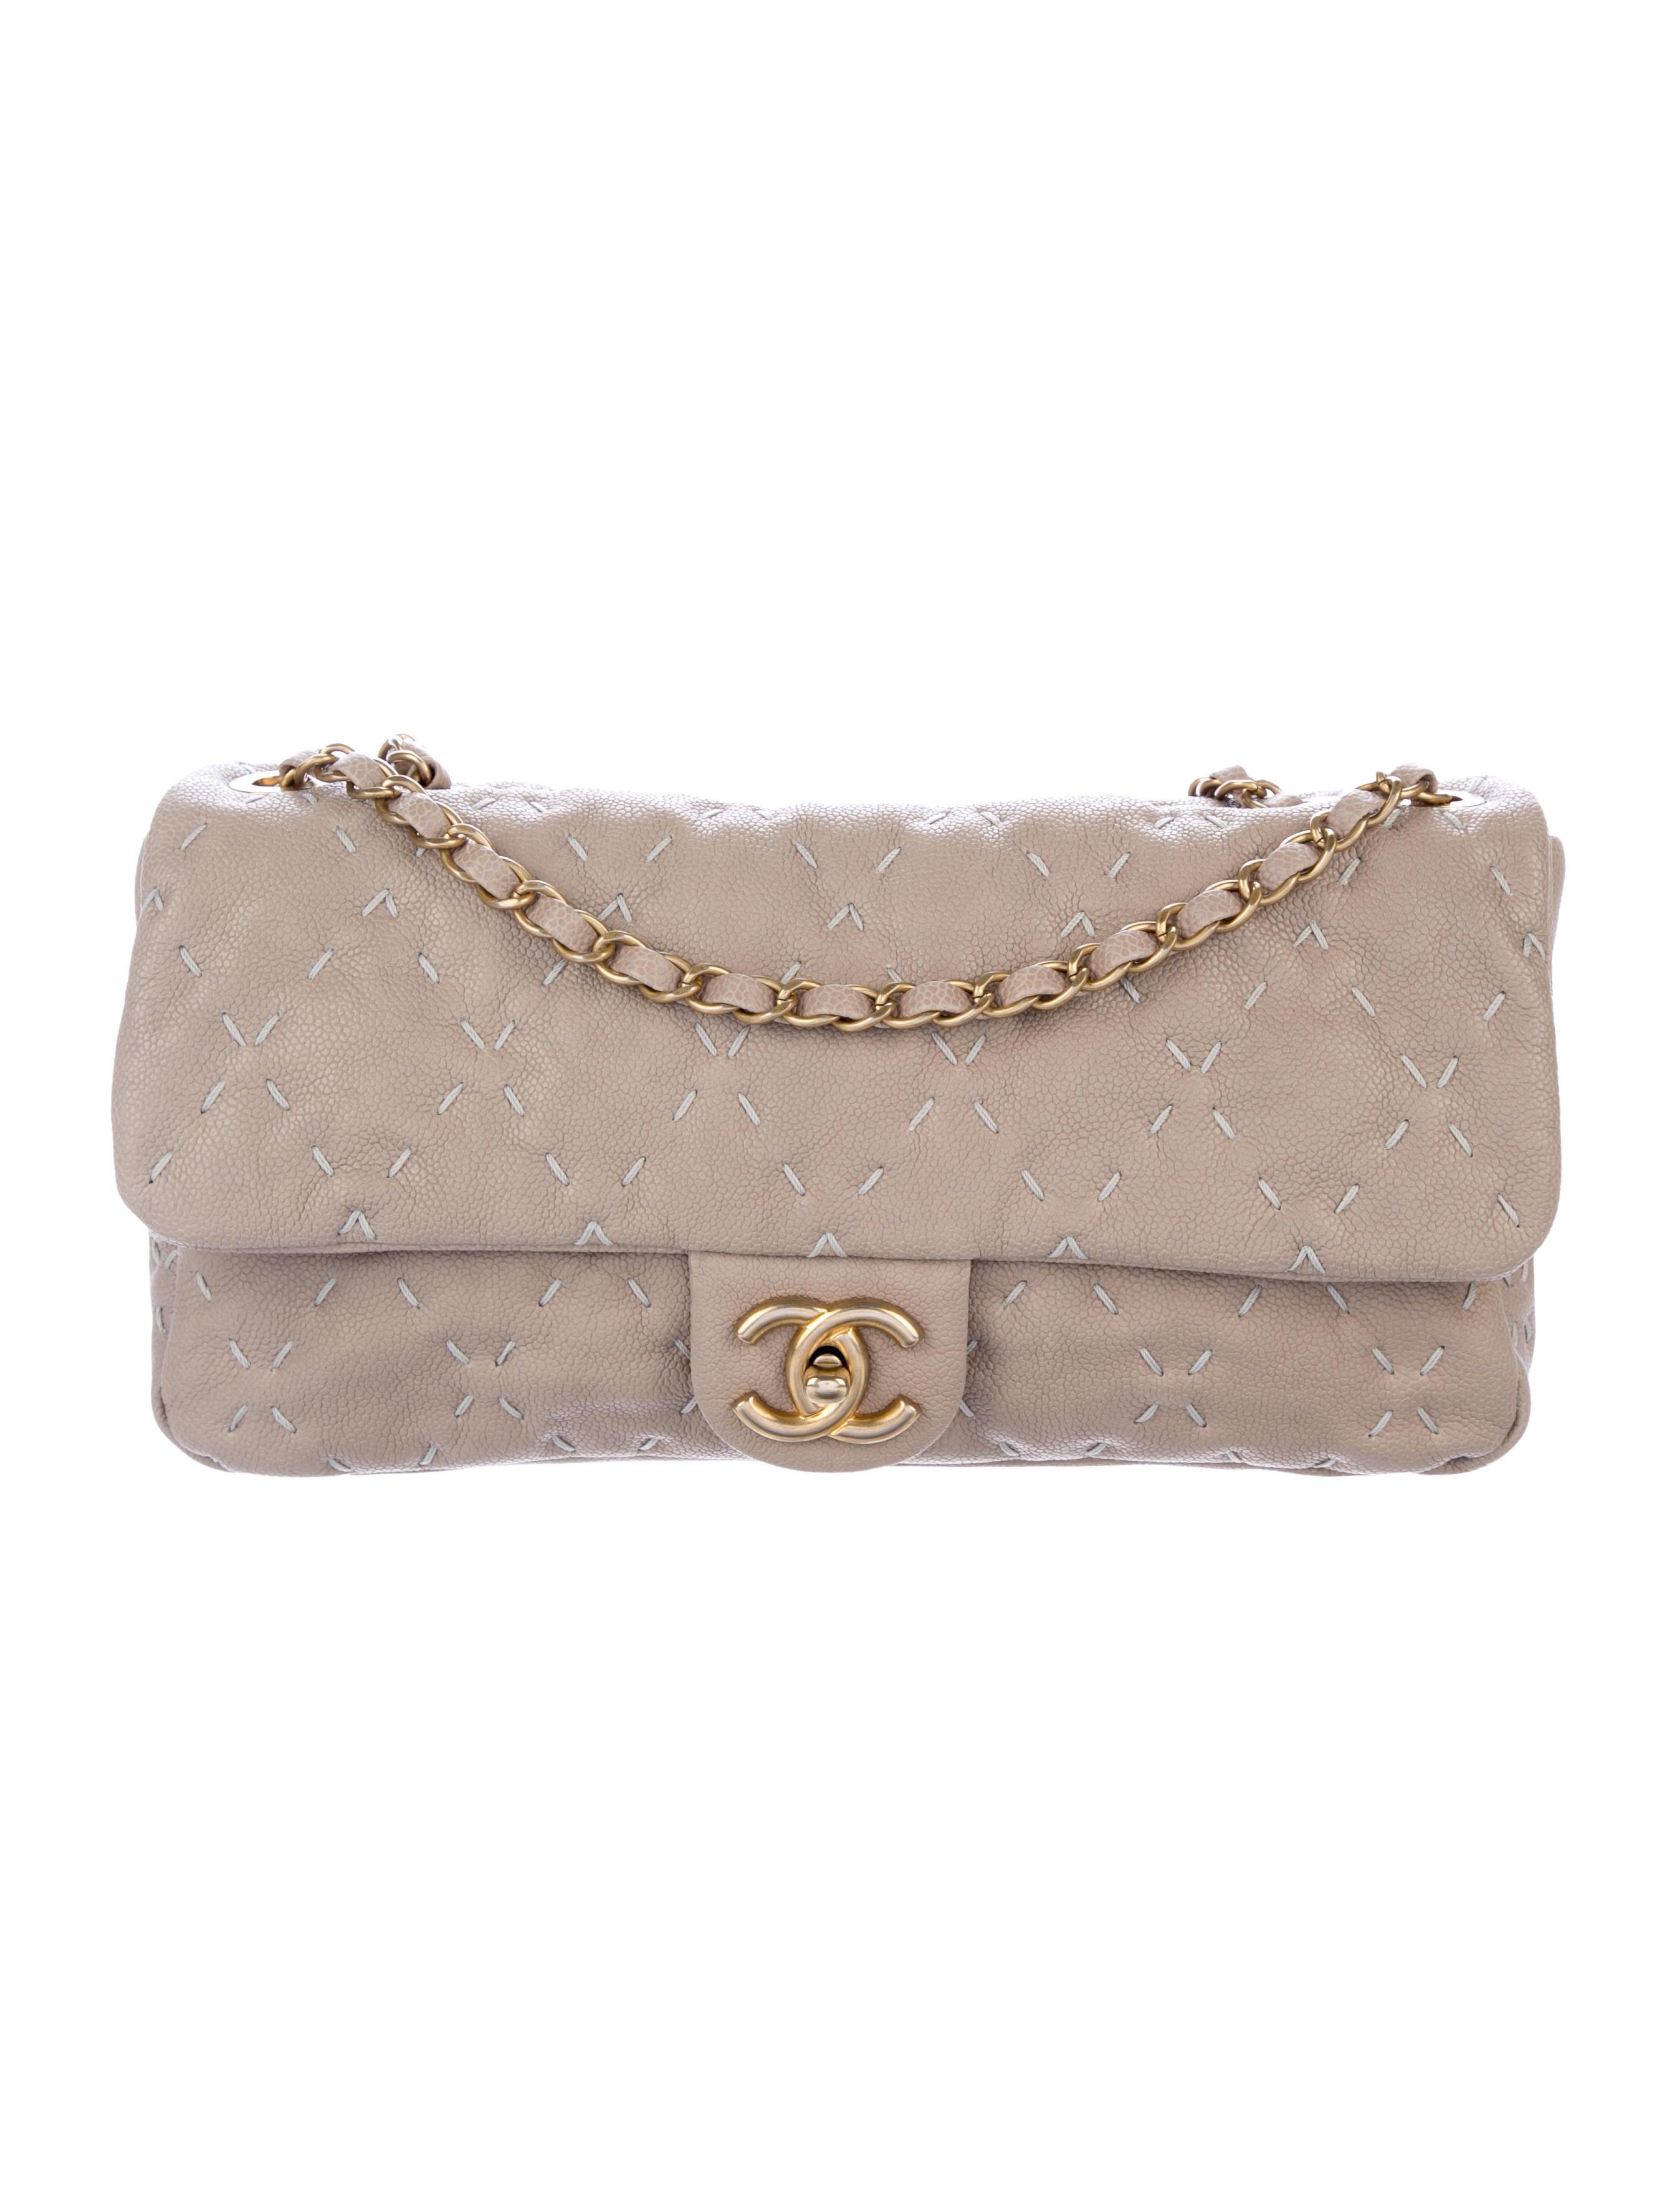 9246cf16f98d Chanel Caviar Wild Stitch Flap Bag - Handbags - CHA239653 | The RealReal